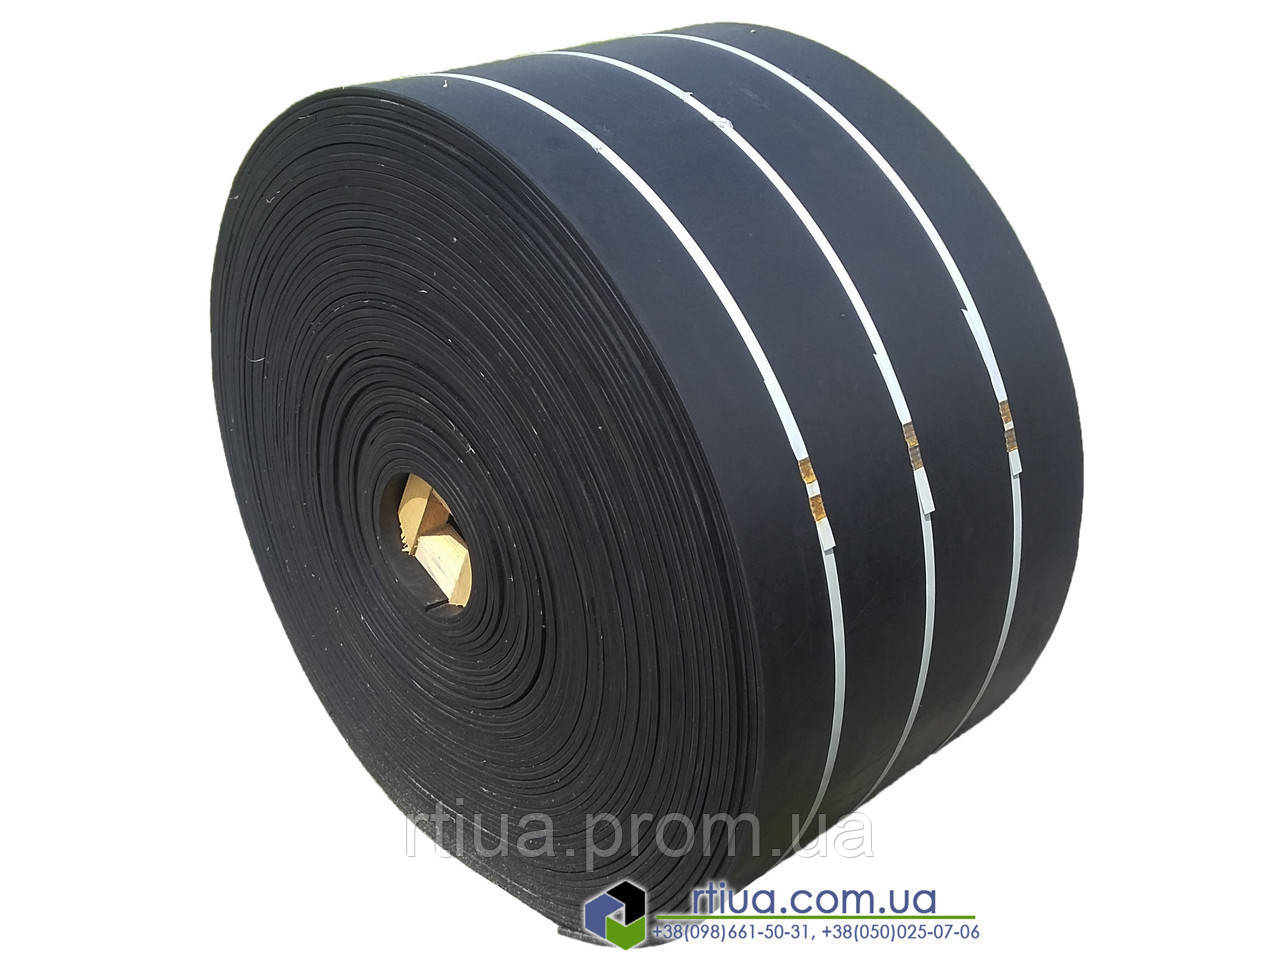 Конвейерная лента 800х11 мм